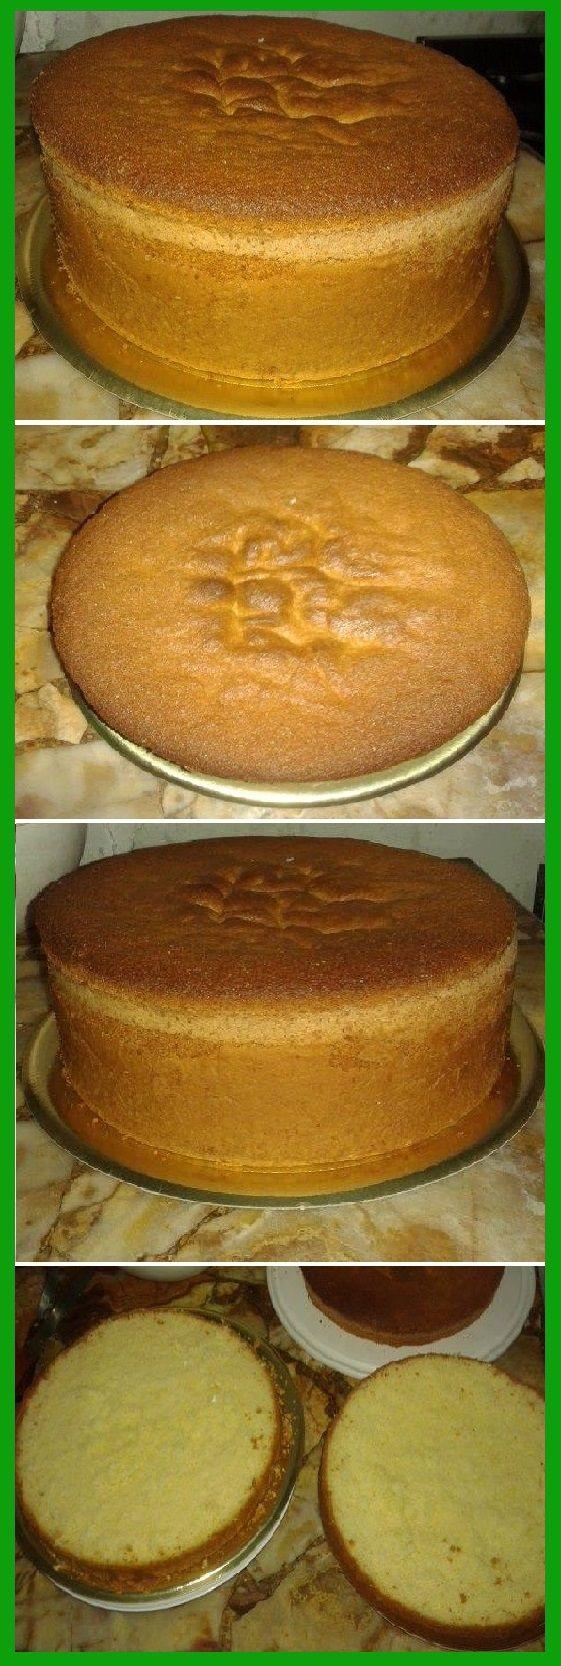 Realiza un Bizcochuelo casero 28 de diámetro y 10 cm de alto...   #bizcochuelo #bizcocho #torta #tartas #casero #receta #recipe #comohacer   #pastel #nestlecocina  #tasty #cocina #chocolate #pan #panes   Si te gusta dinos HOLA y dale a Me Gusta MIREN …